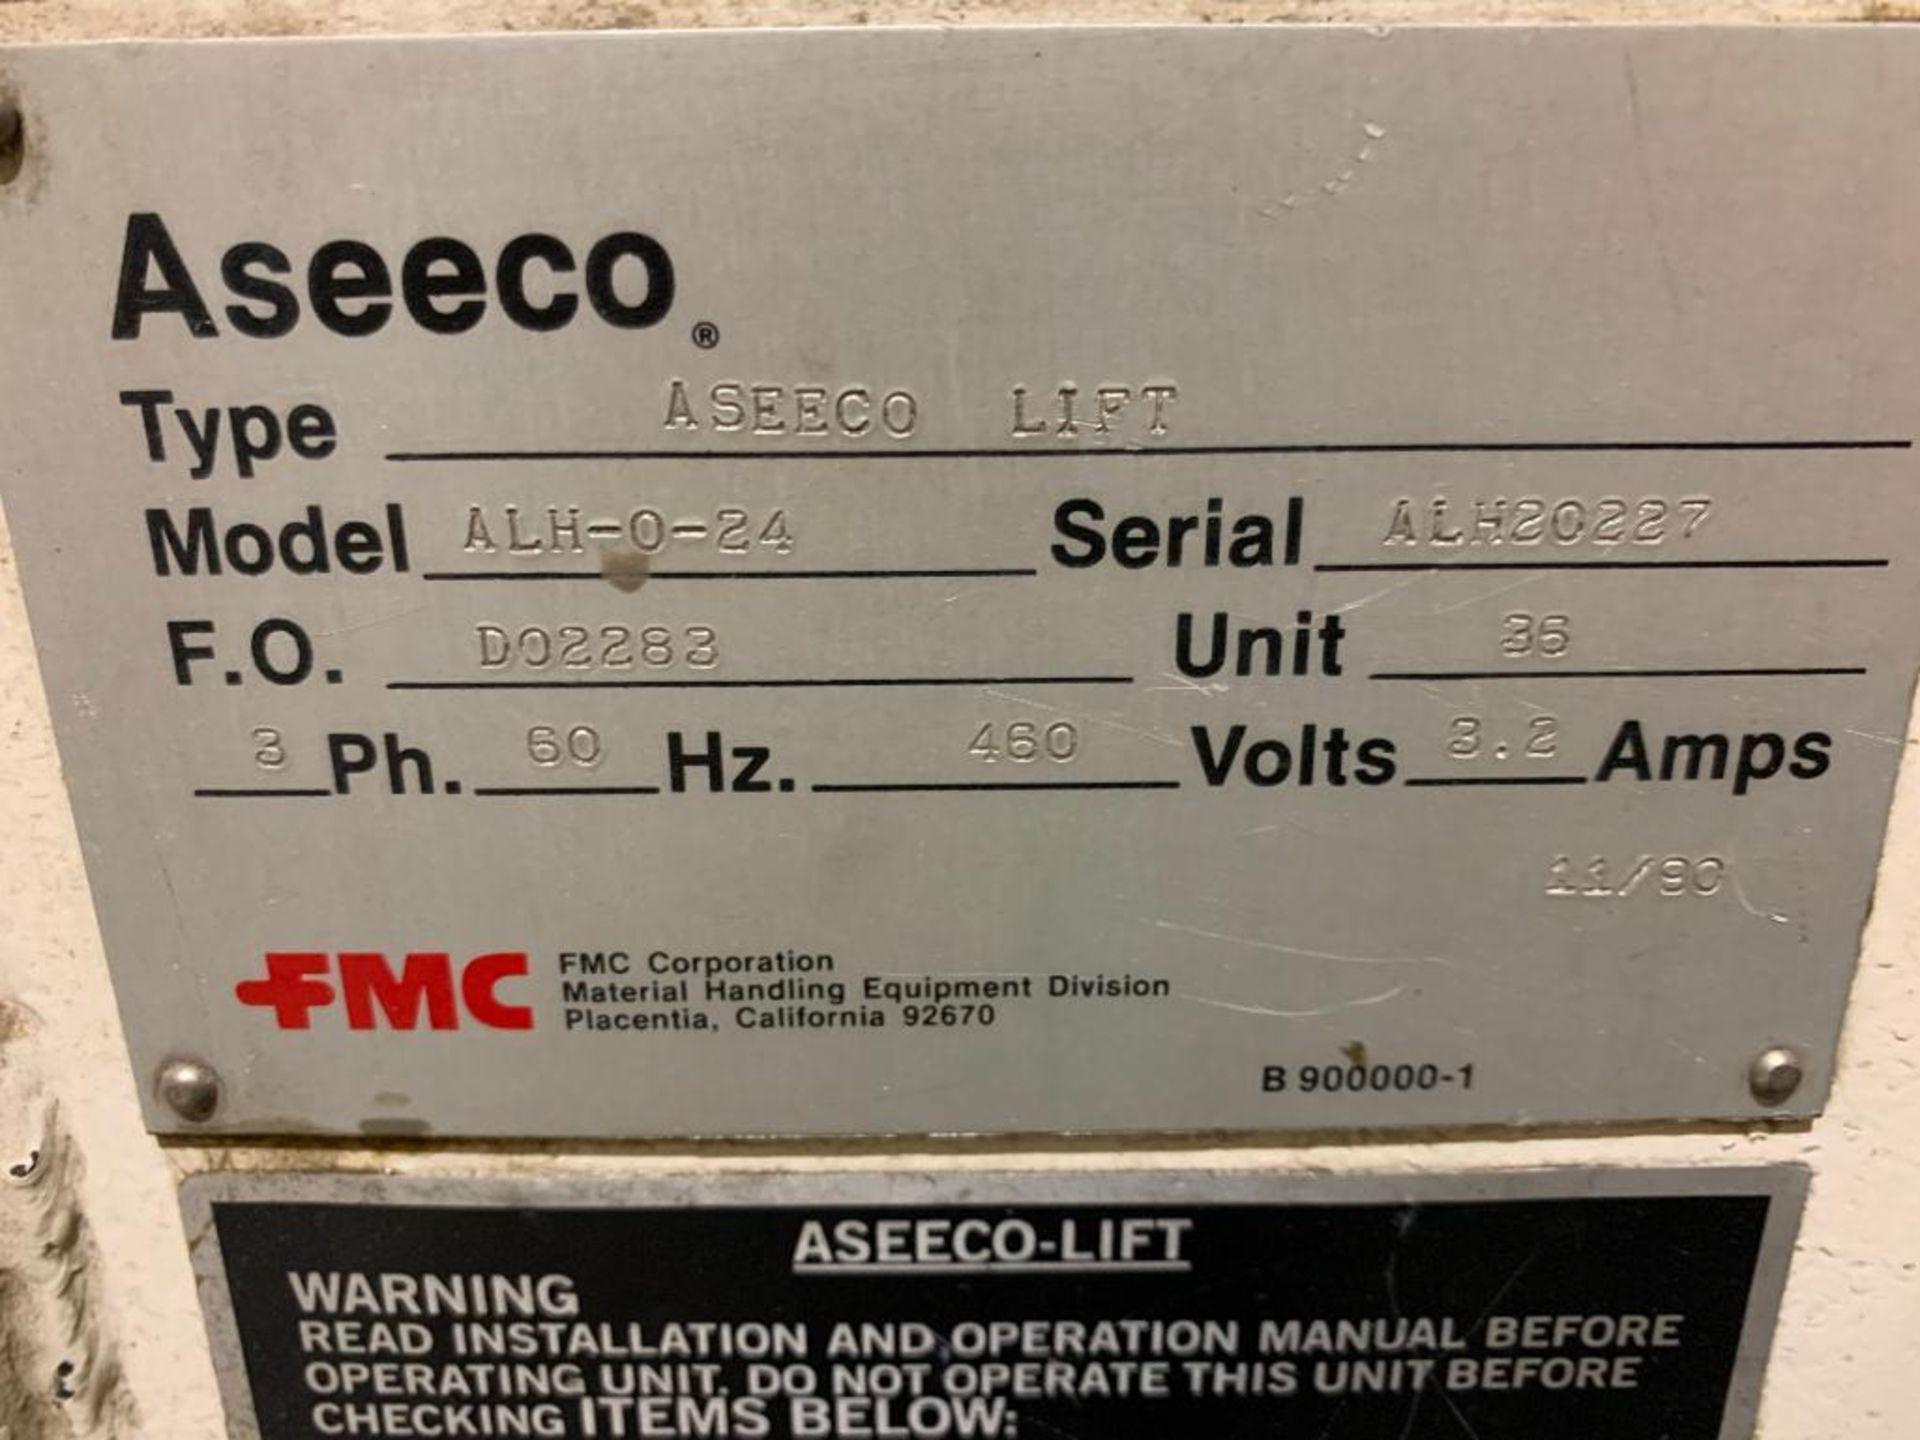 1990 Aseeco horizontal bucket elevator, model ALH-0-24 - Image 4 of 12